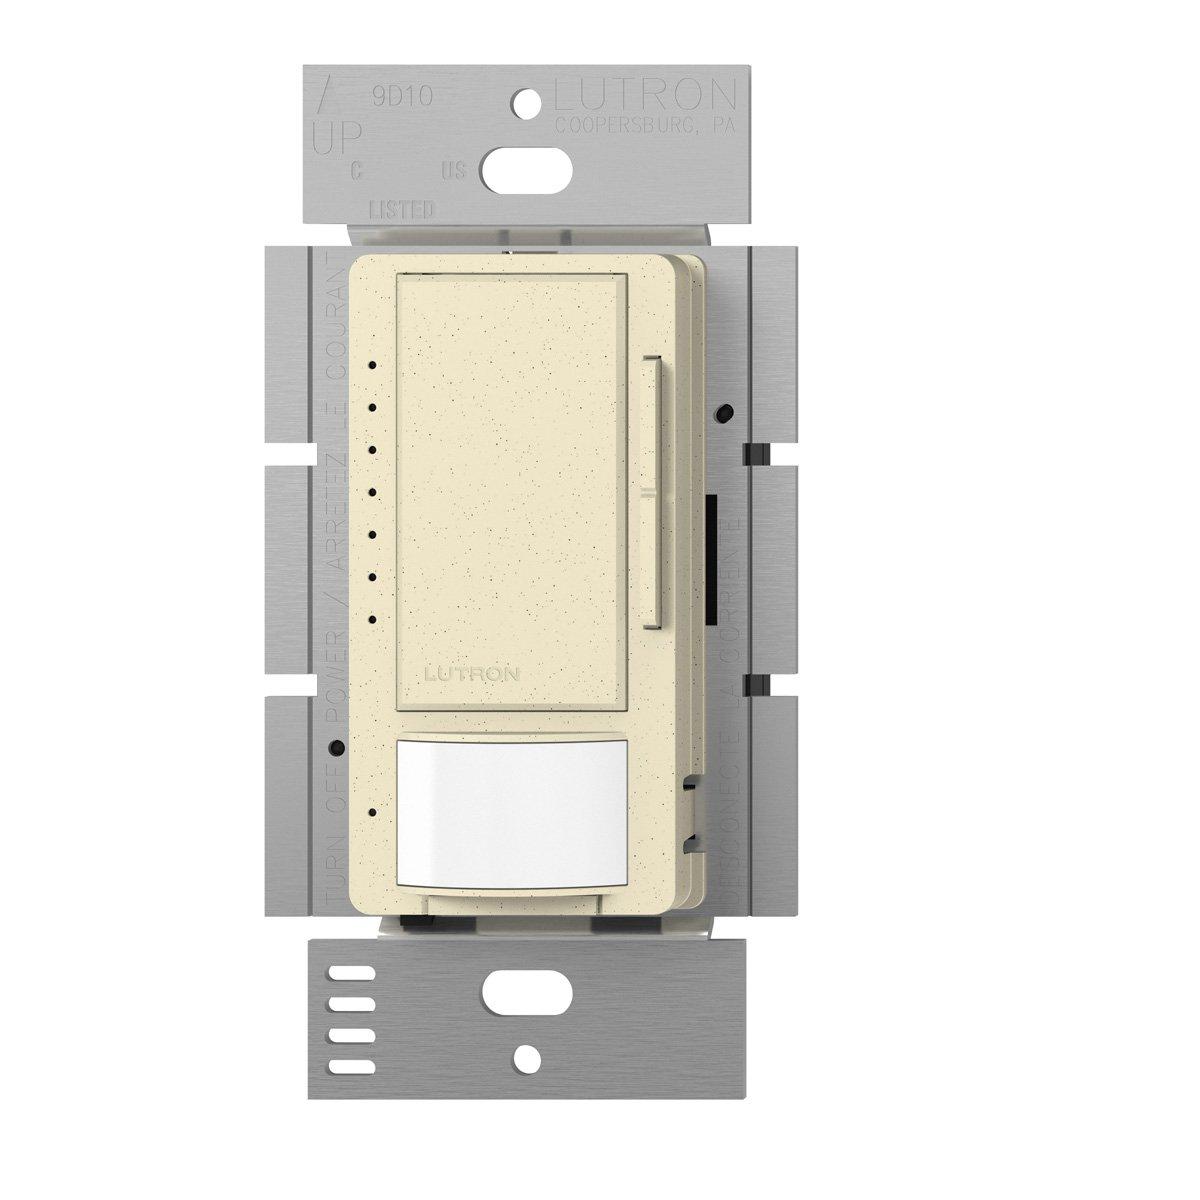 Lutron Maestro CL単極/ multi-location Vacancy Sensingディマー MSCL-VP153M-LS 1 B00FQL2CHC ライムストーン(Limestone) ライムストーン(Limestone)